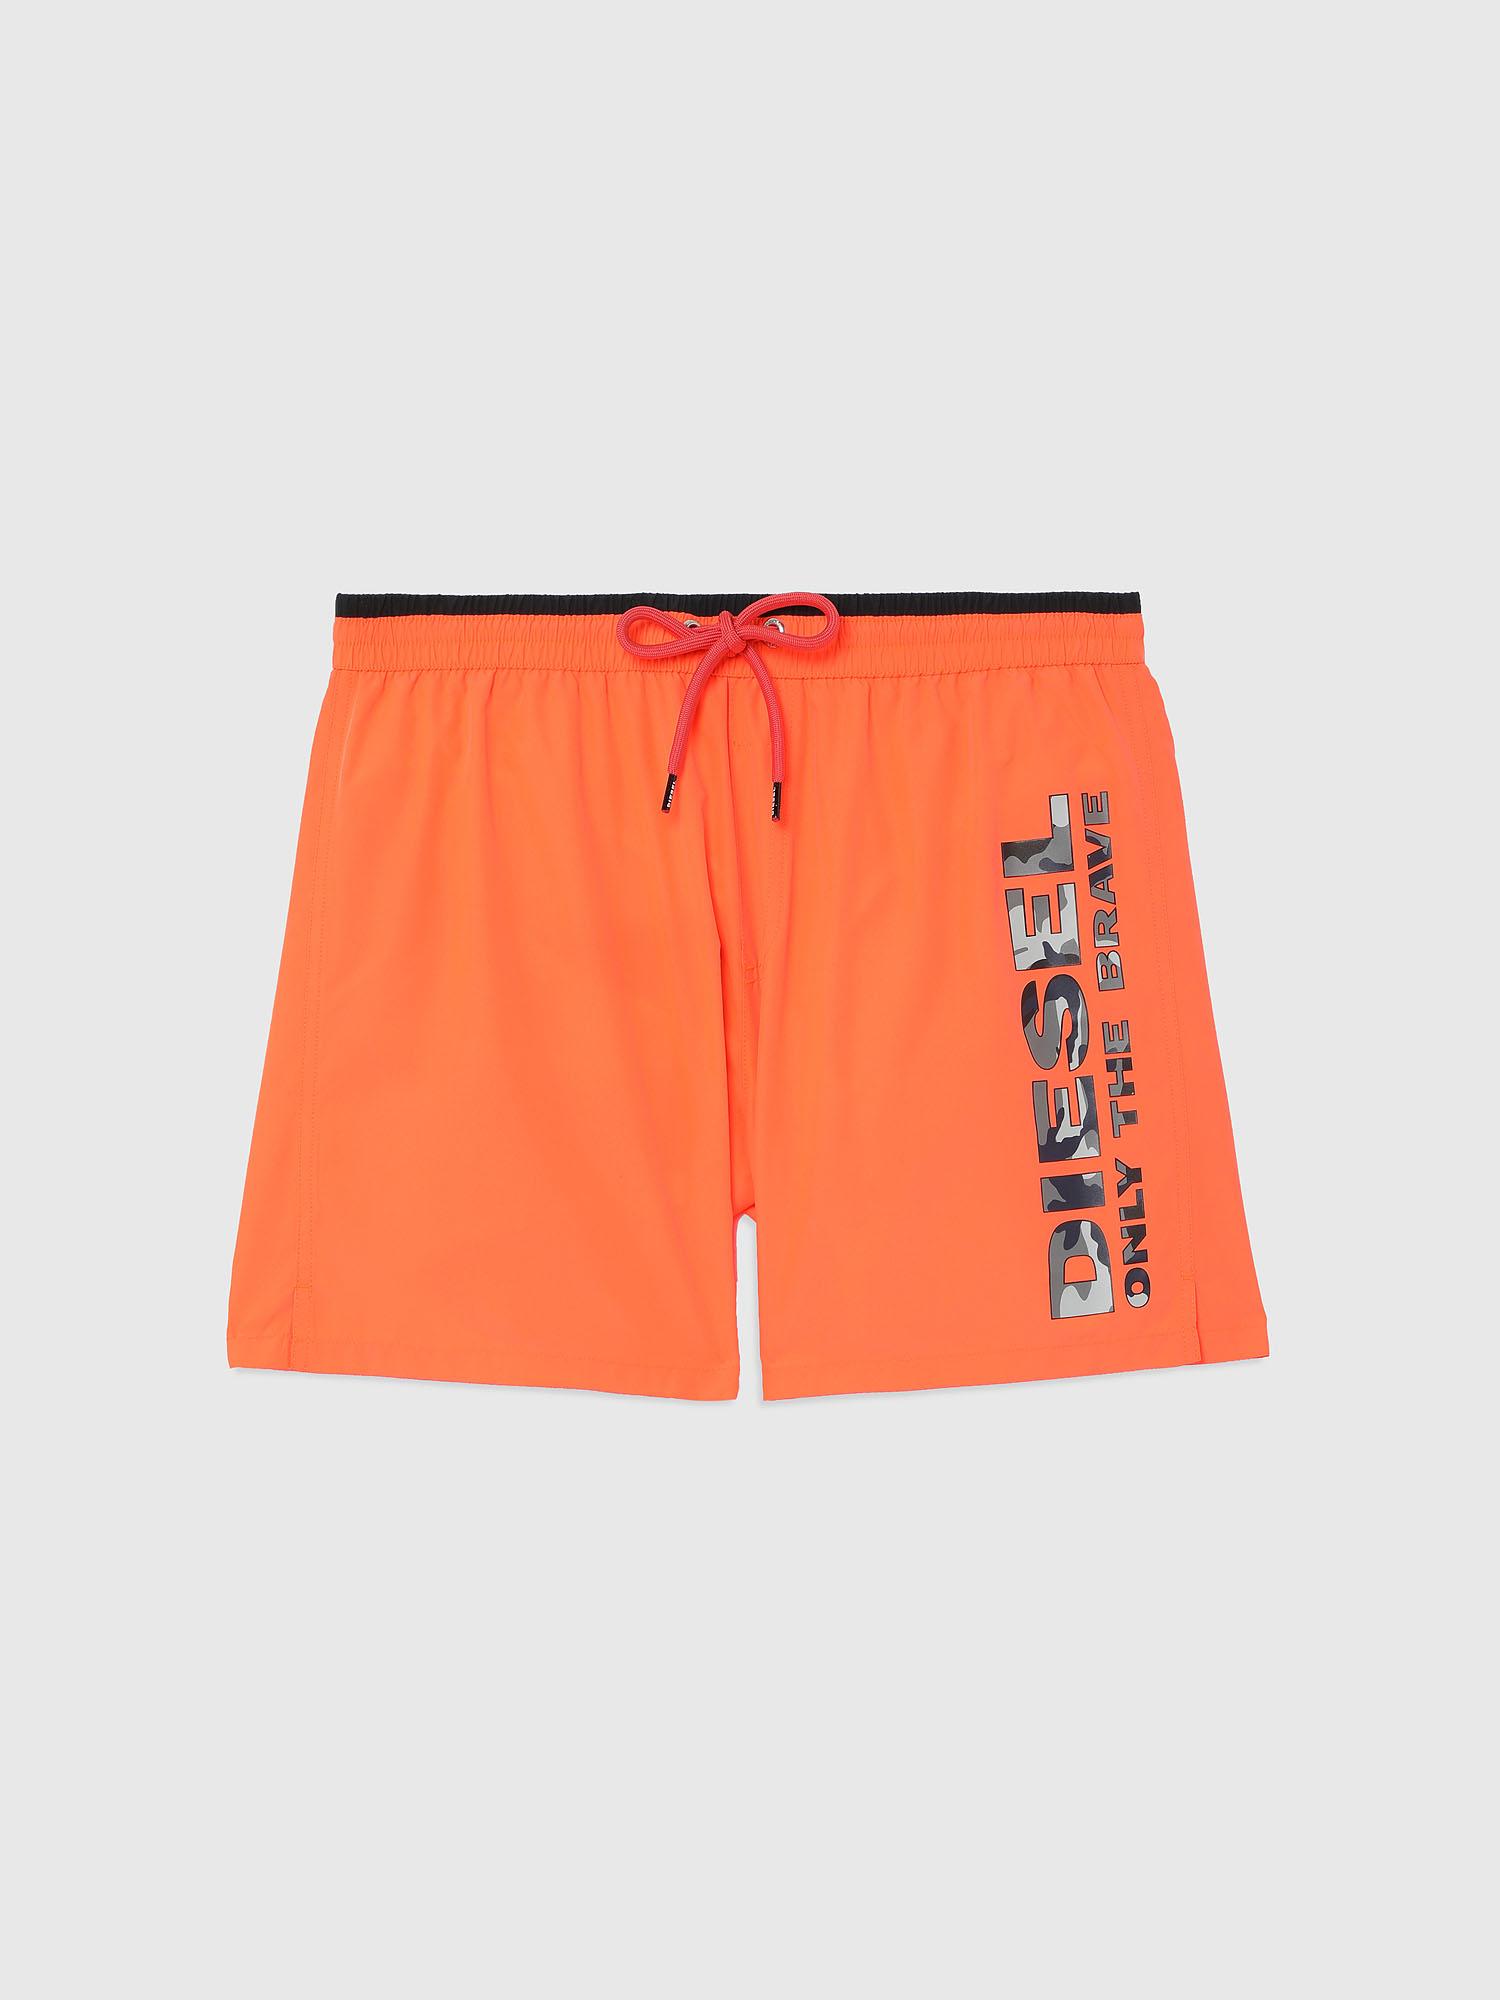 BMBX-WAVE 2.017 Orange